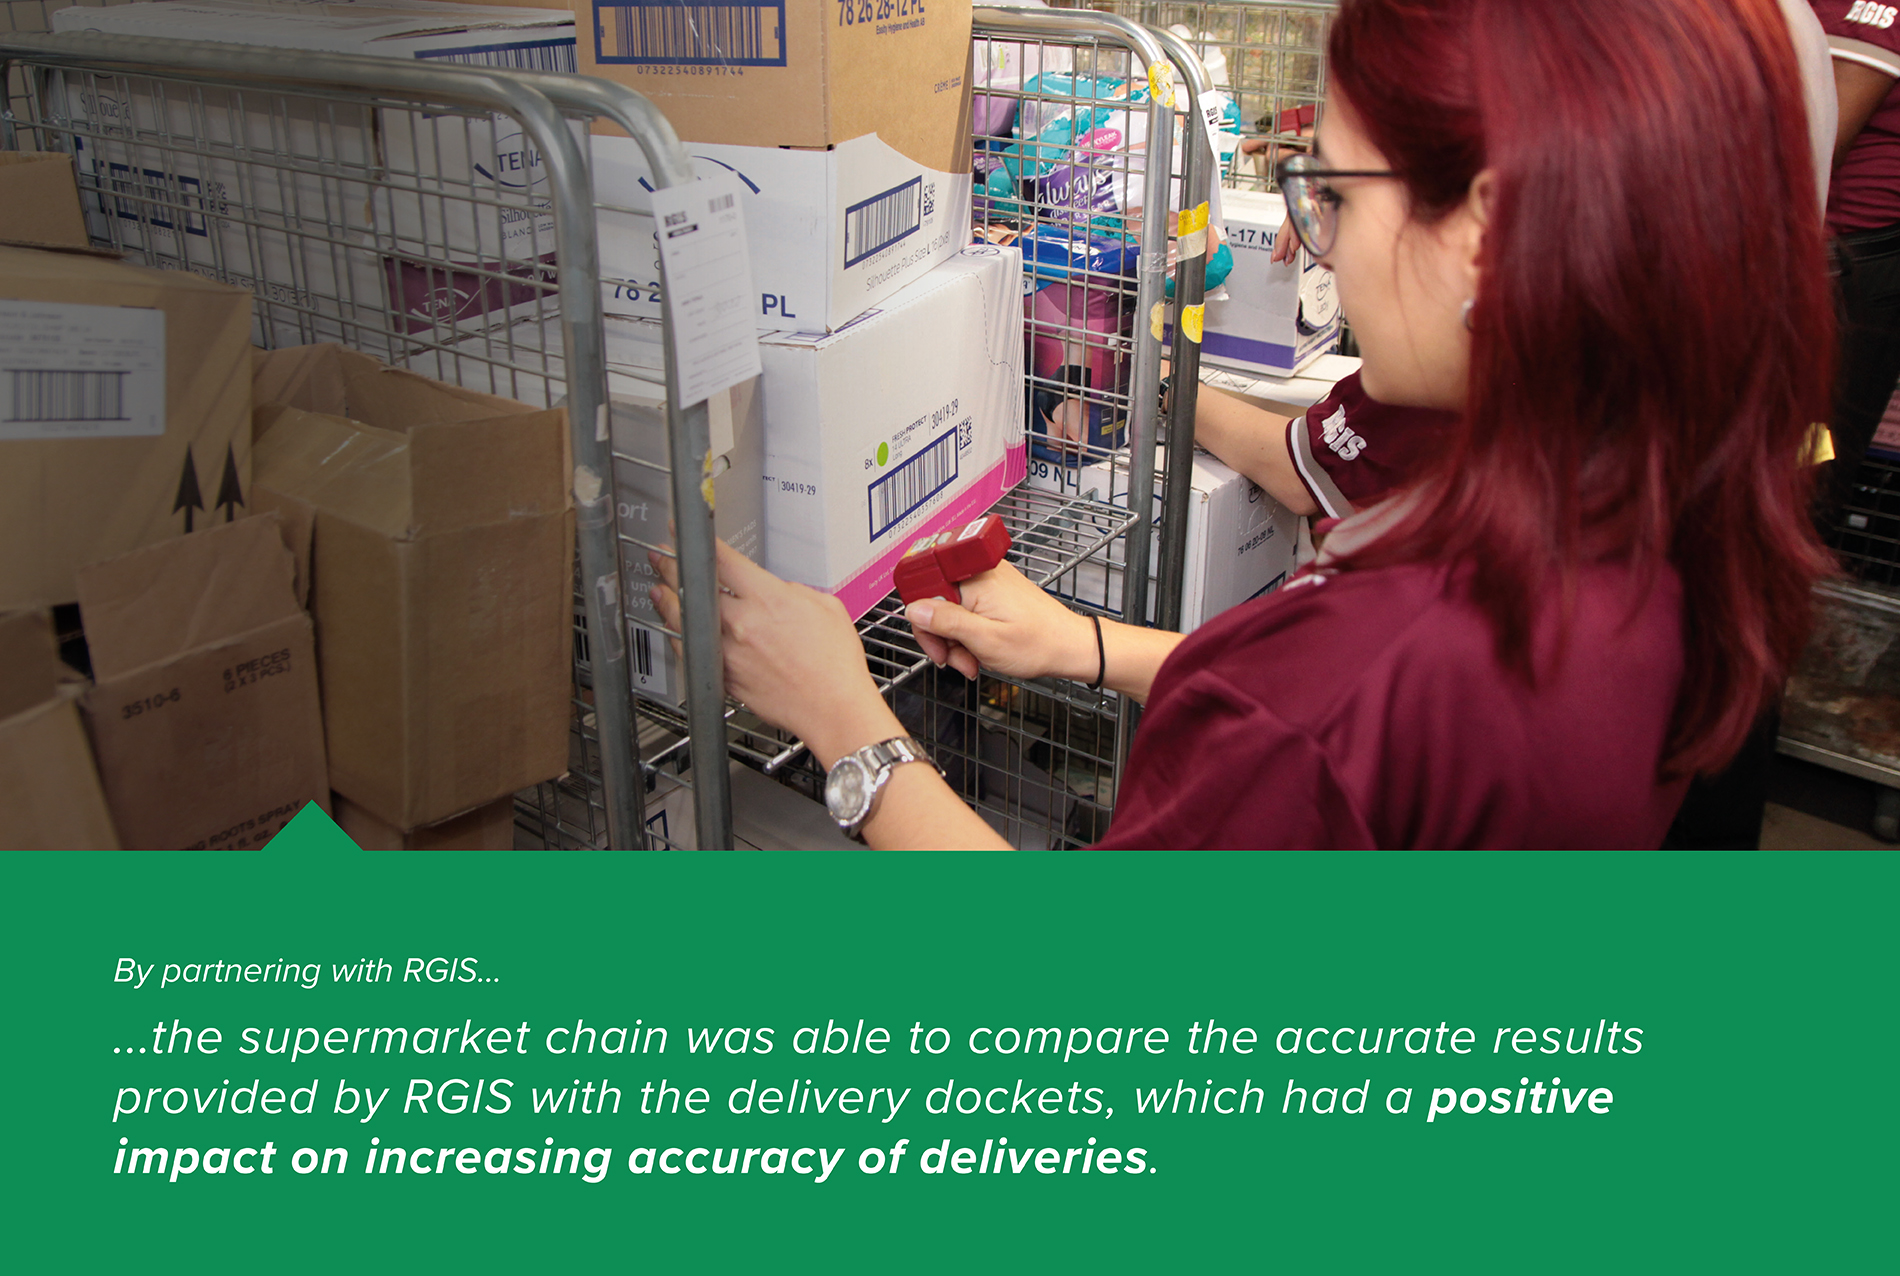 Distribution Center Delivery Checks